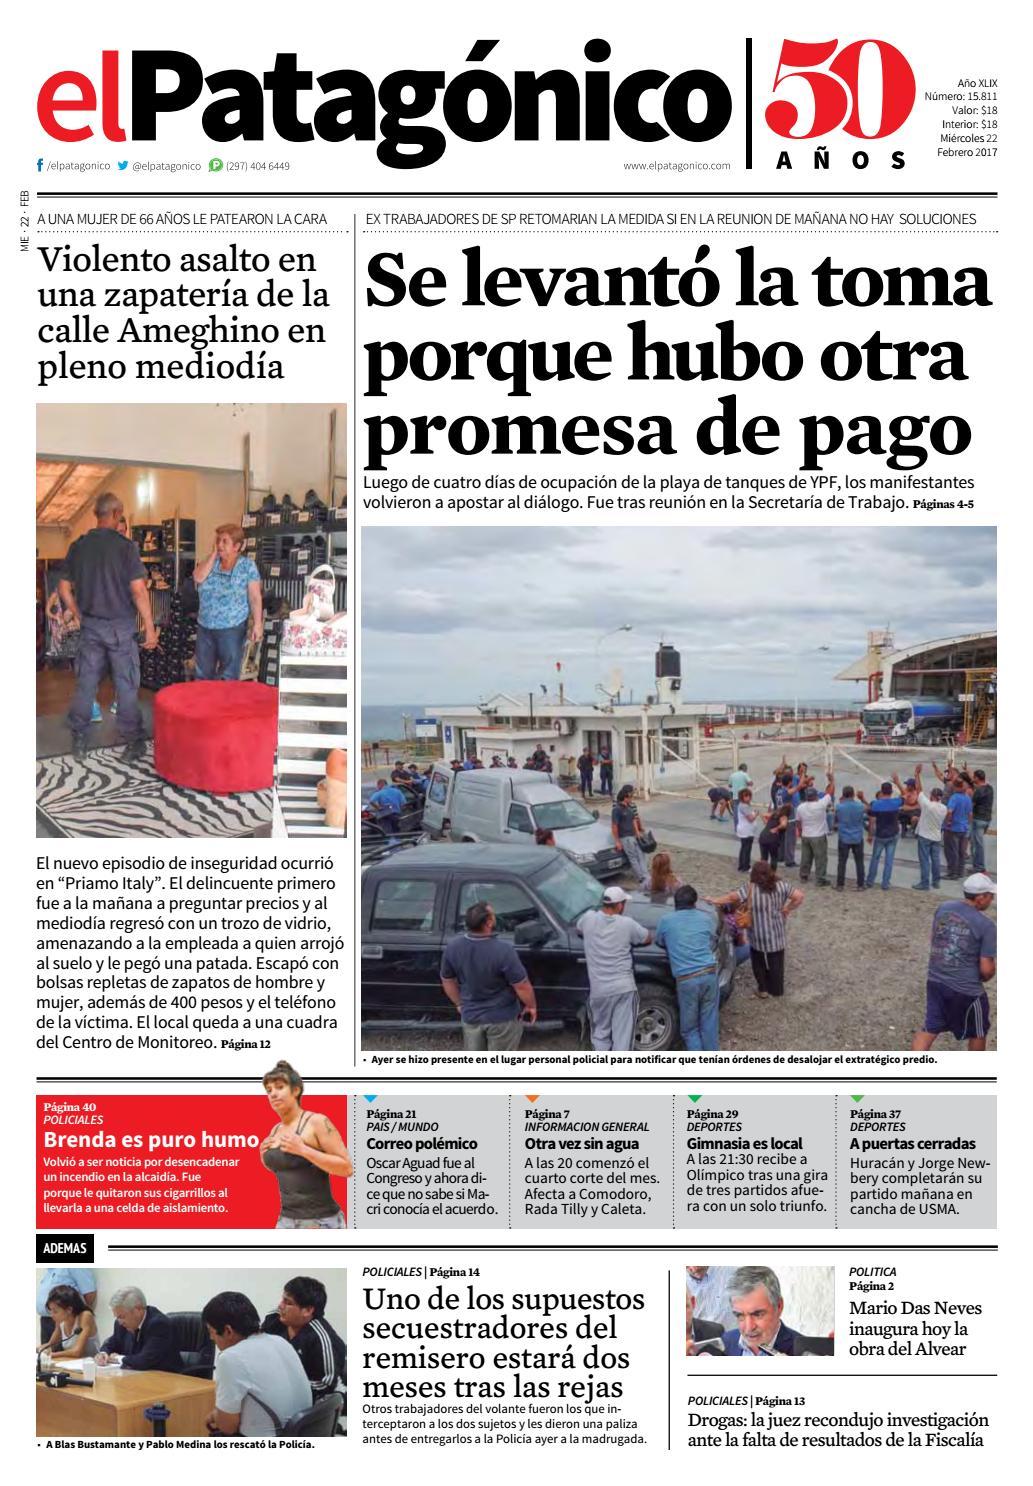 edicion232221022017.pdf by El Patagonico - issuu 1354ca8c0c2